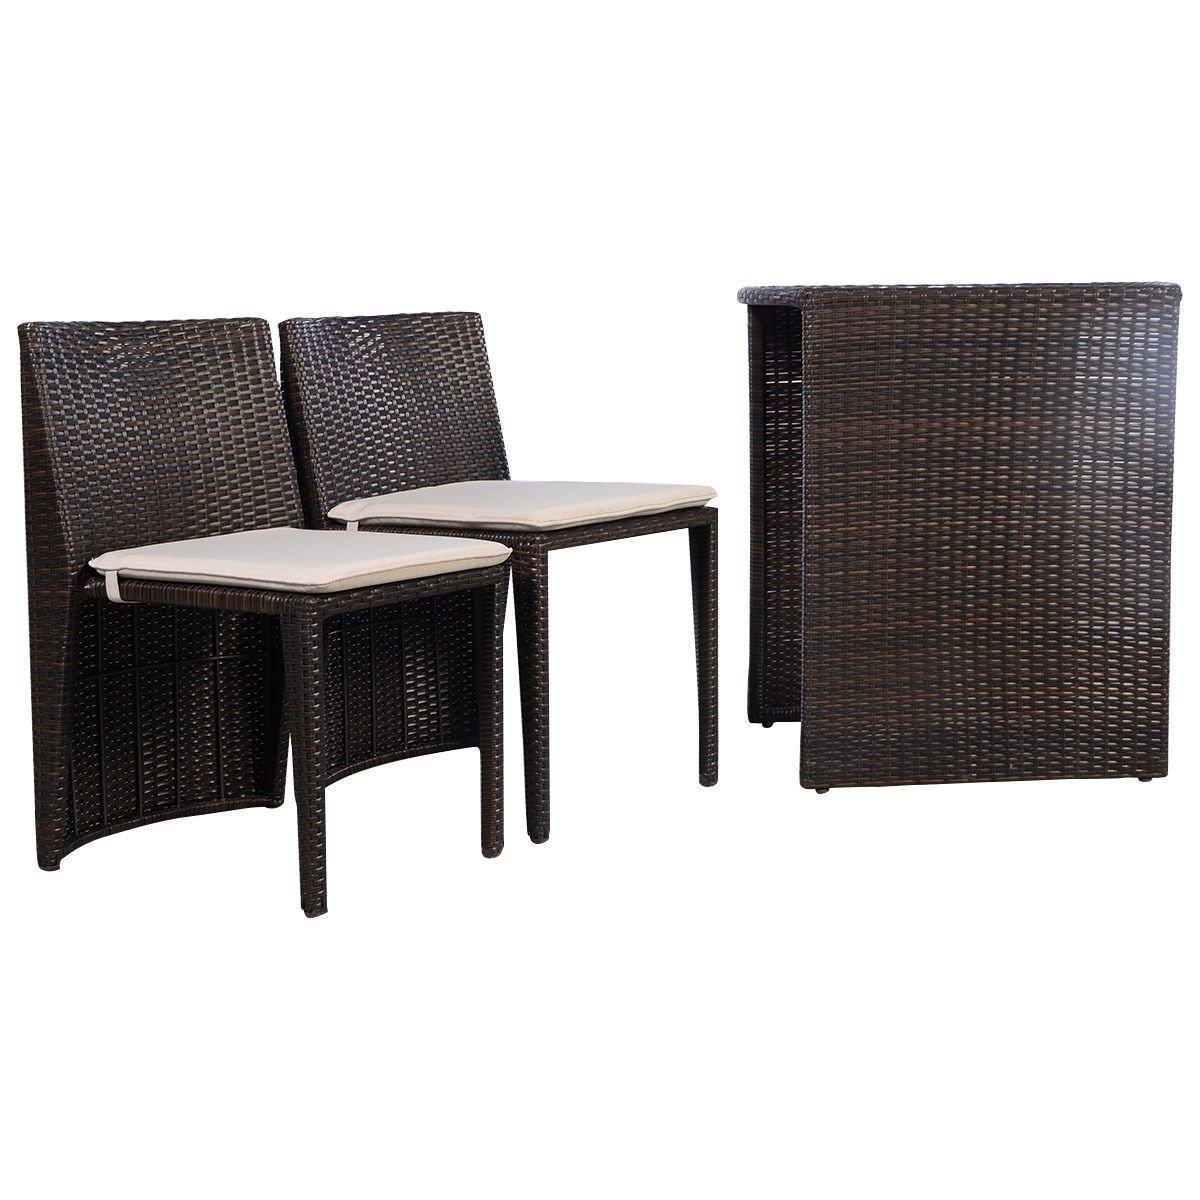 Good Amazon.com: Giantex 3 PCS Cushioned Outdoor Wicker Patio Set Garden Lawn  Sofa Furniture Seat Brown: Garden U0026 Outdoor